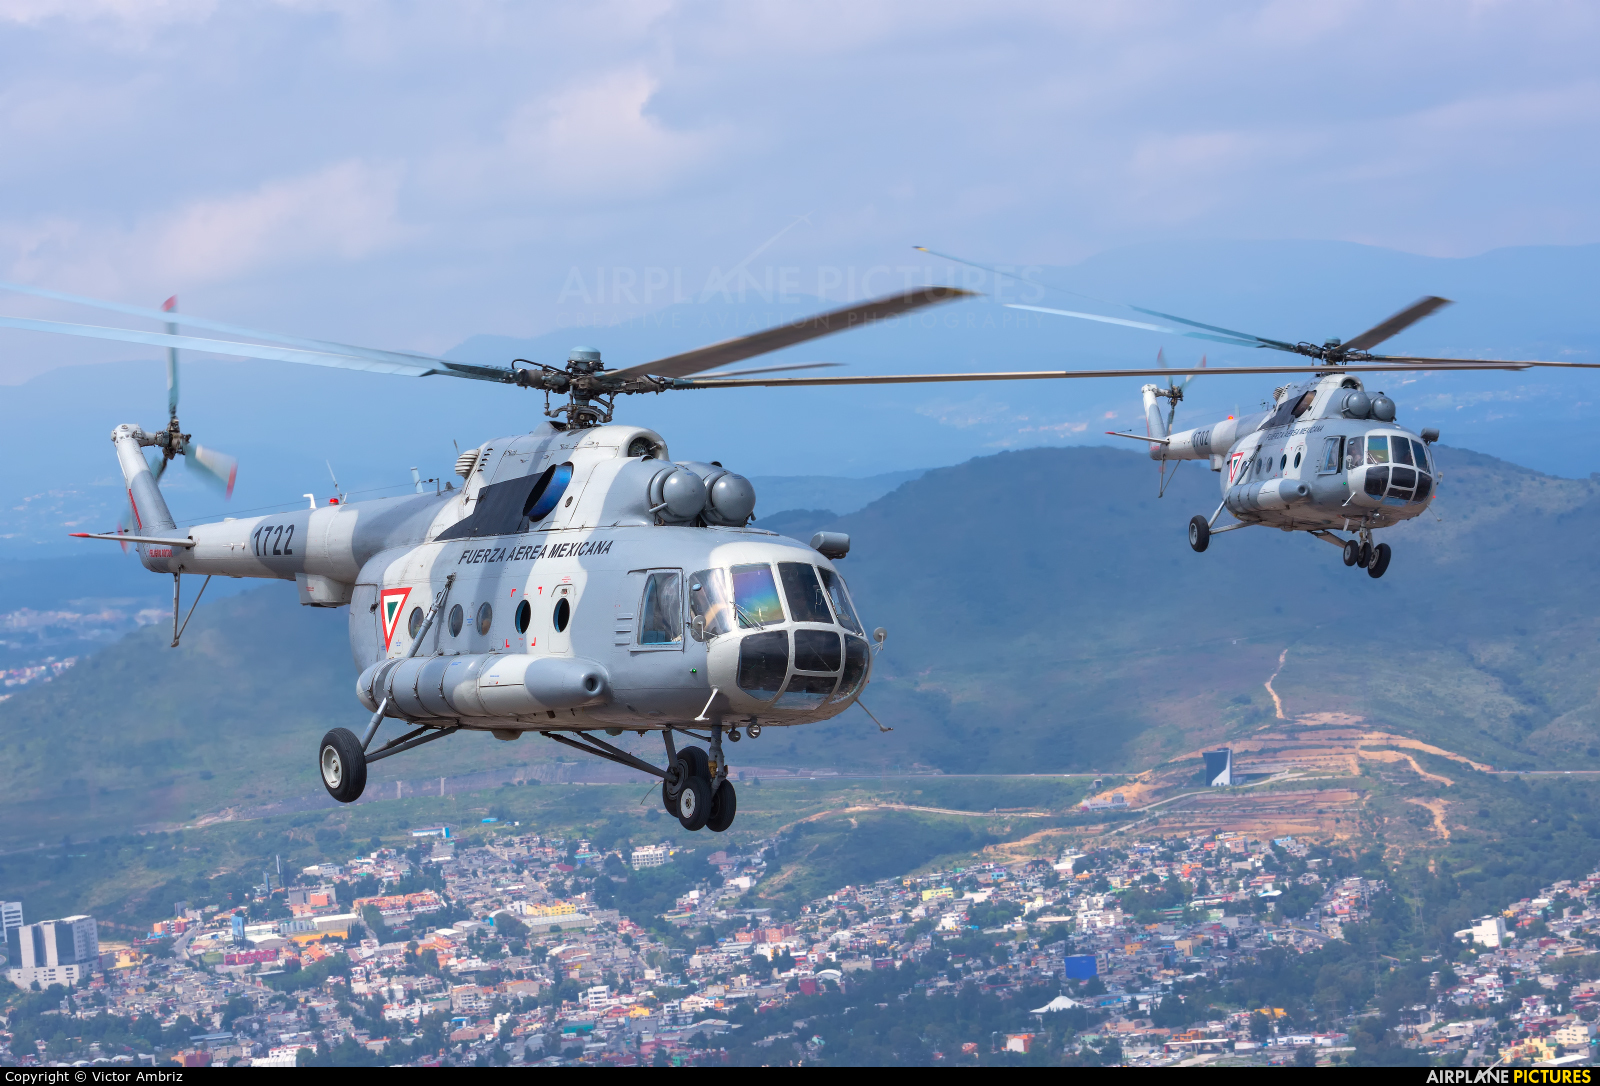 Mexico - Air Force 1722 aircraft at In Flight - Mexico